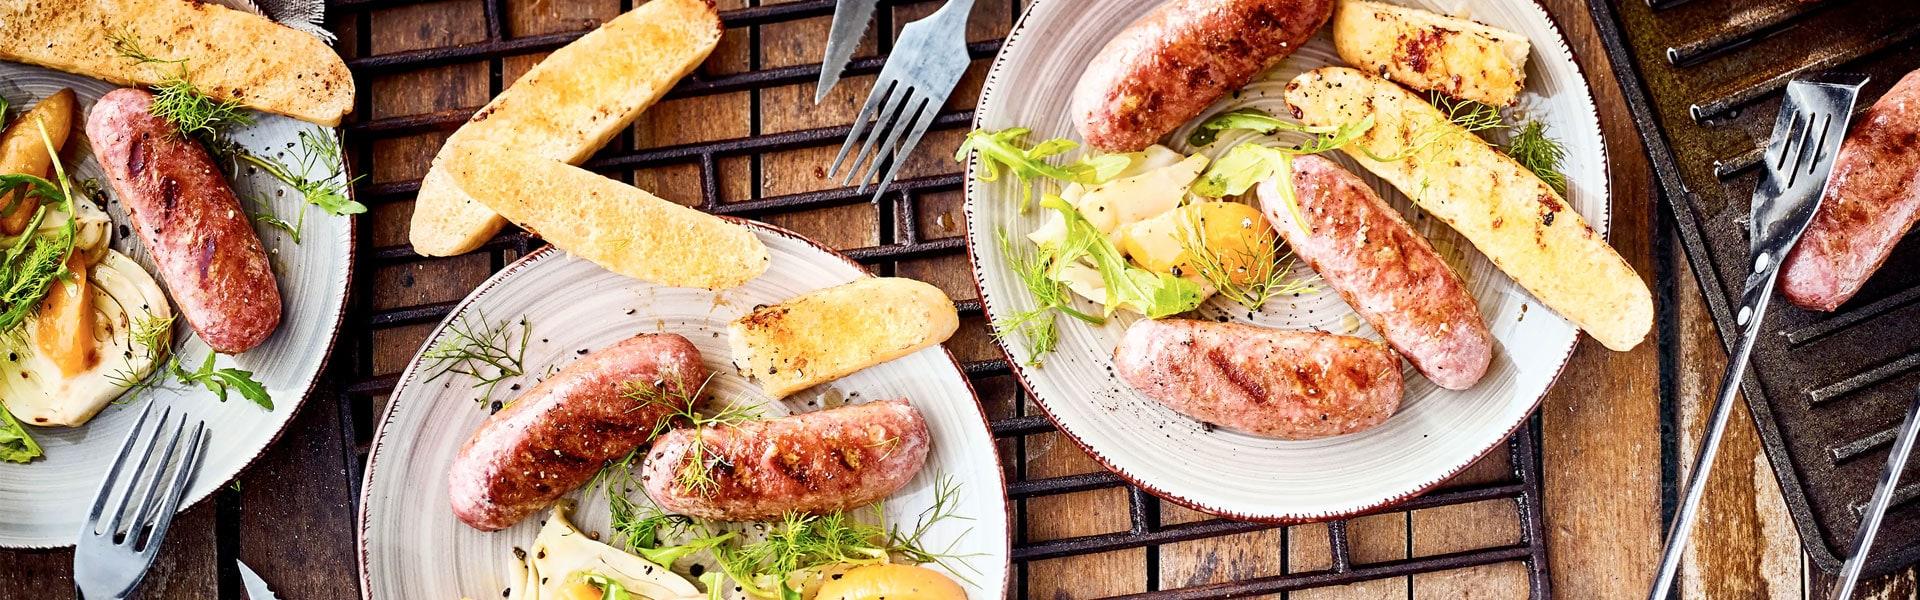 Salsiccia vom Grill